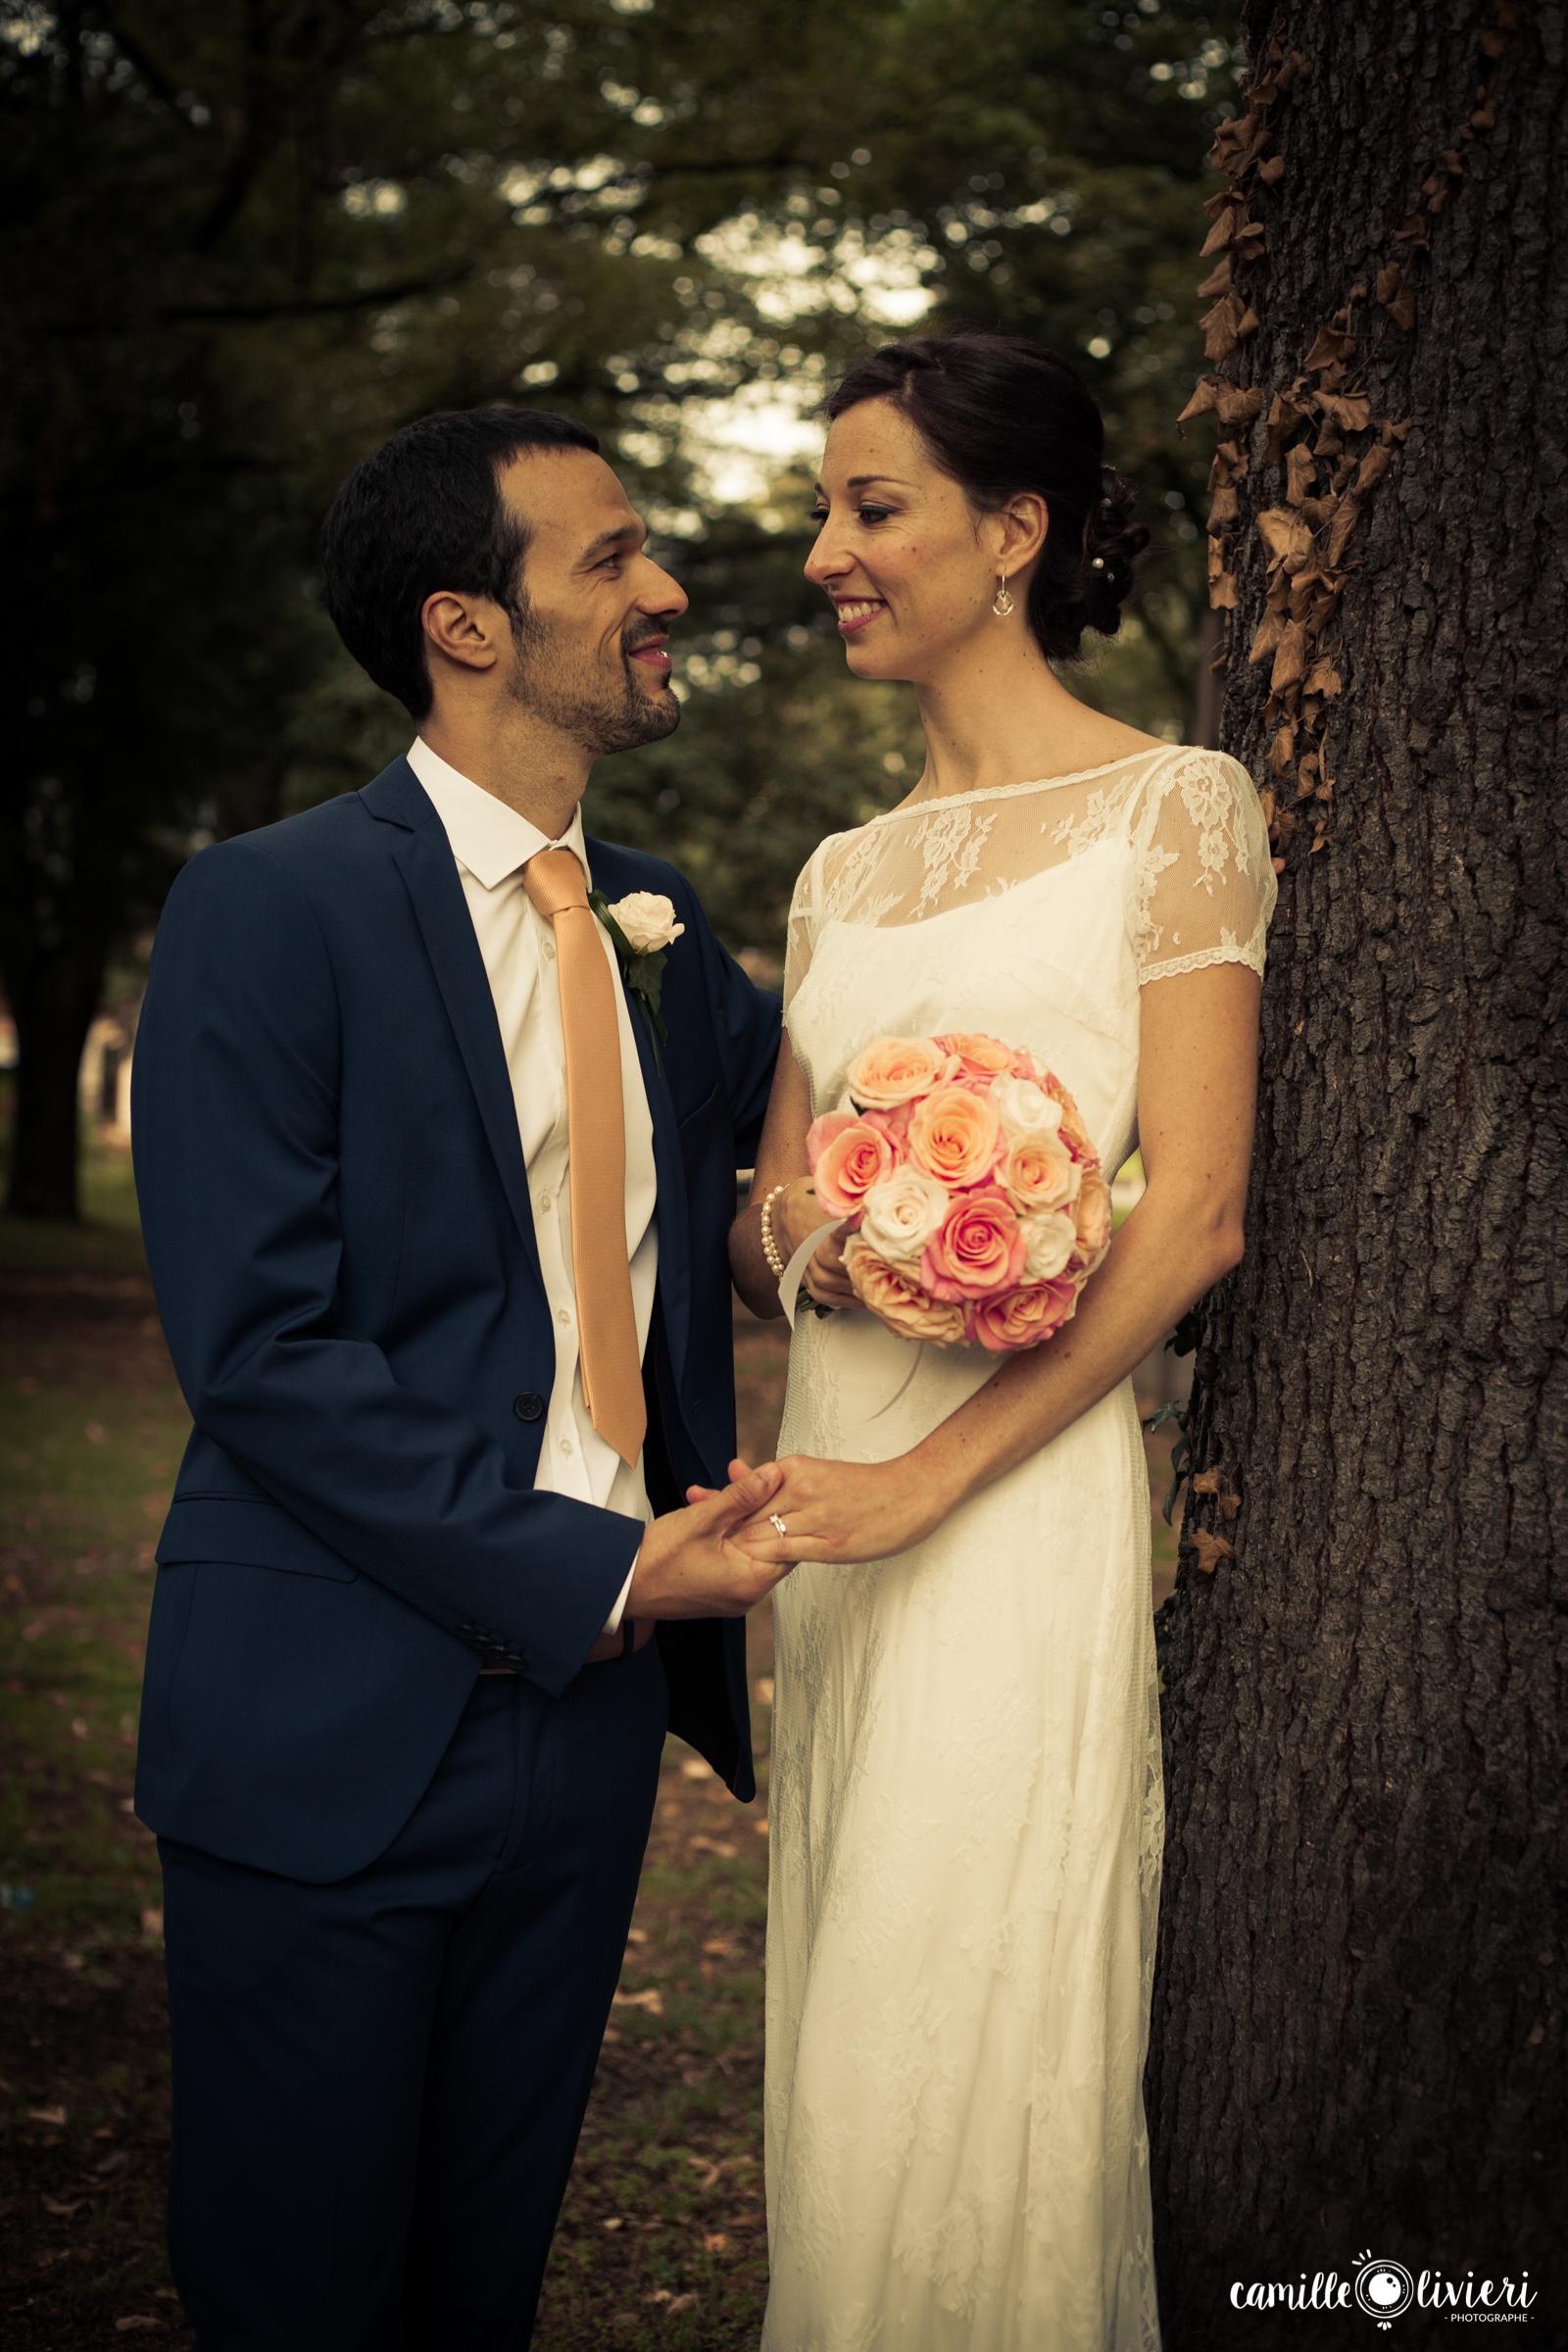 photographe_grenoble_mariage_camilleolivieri_047-2